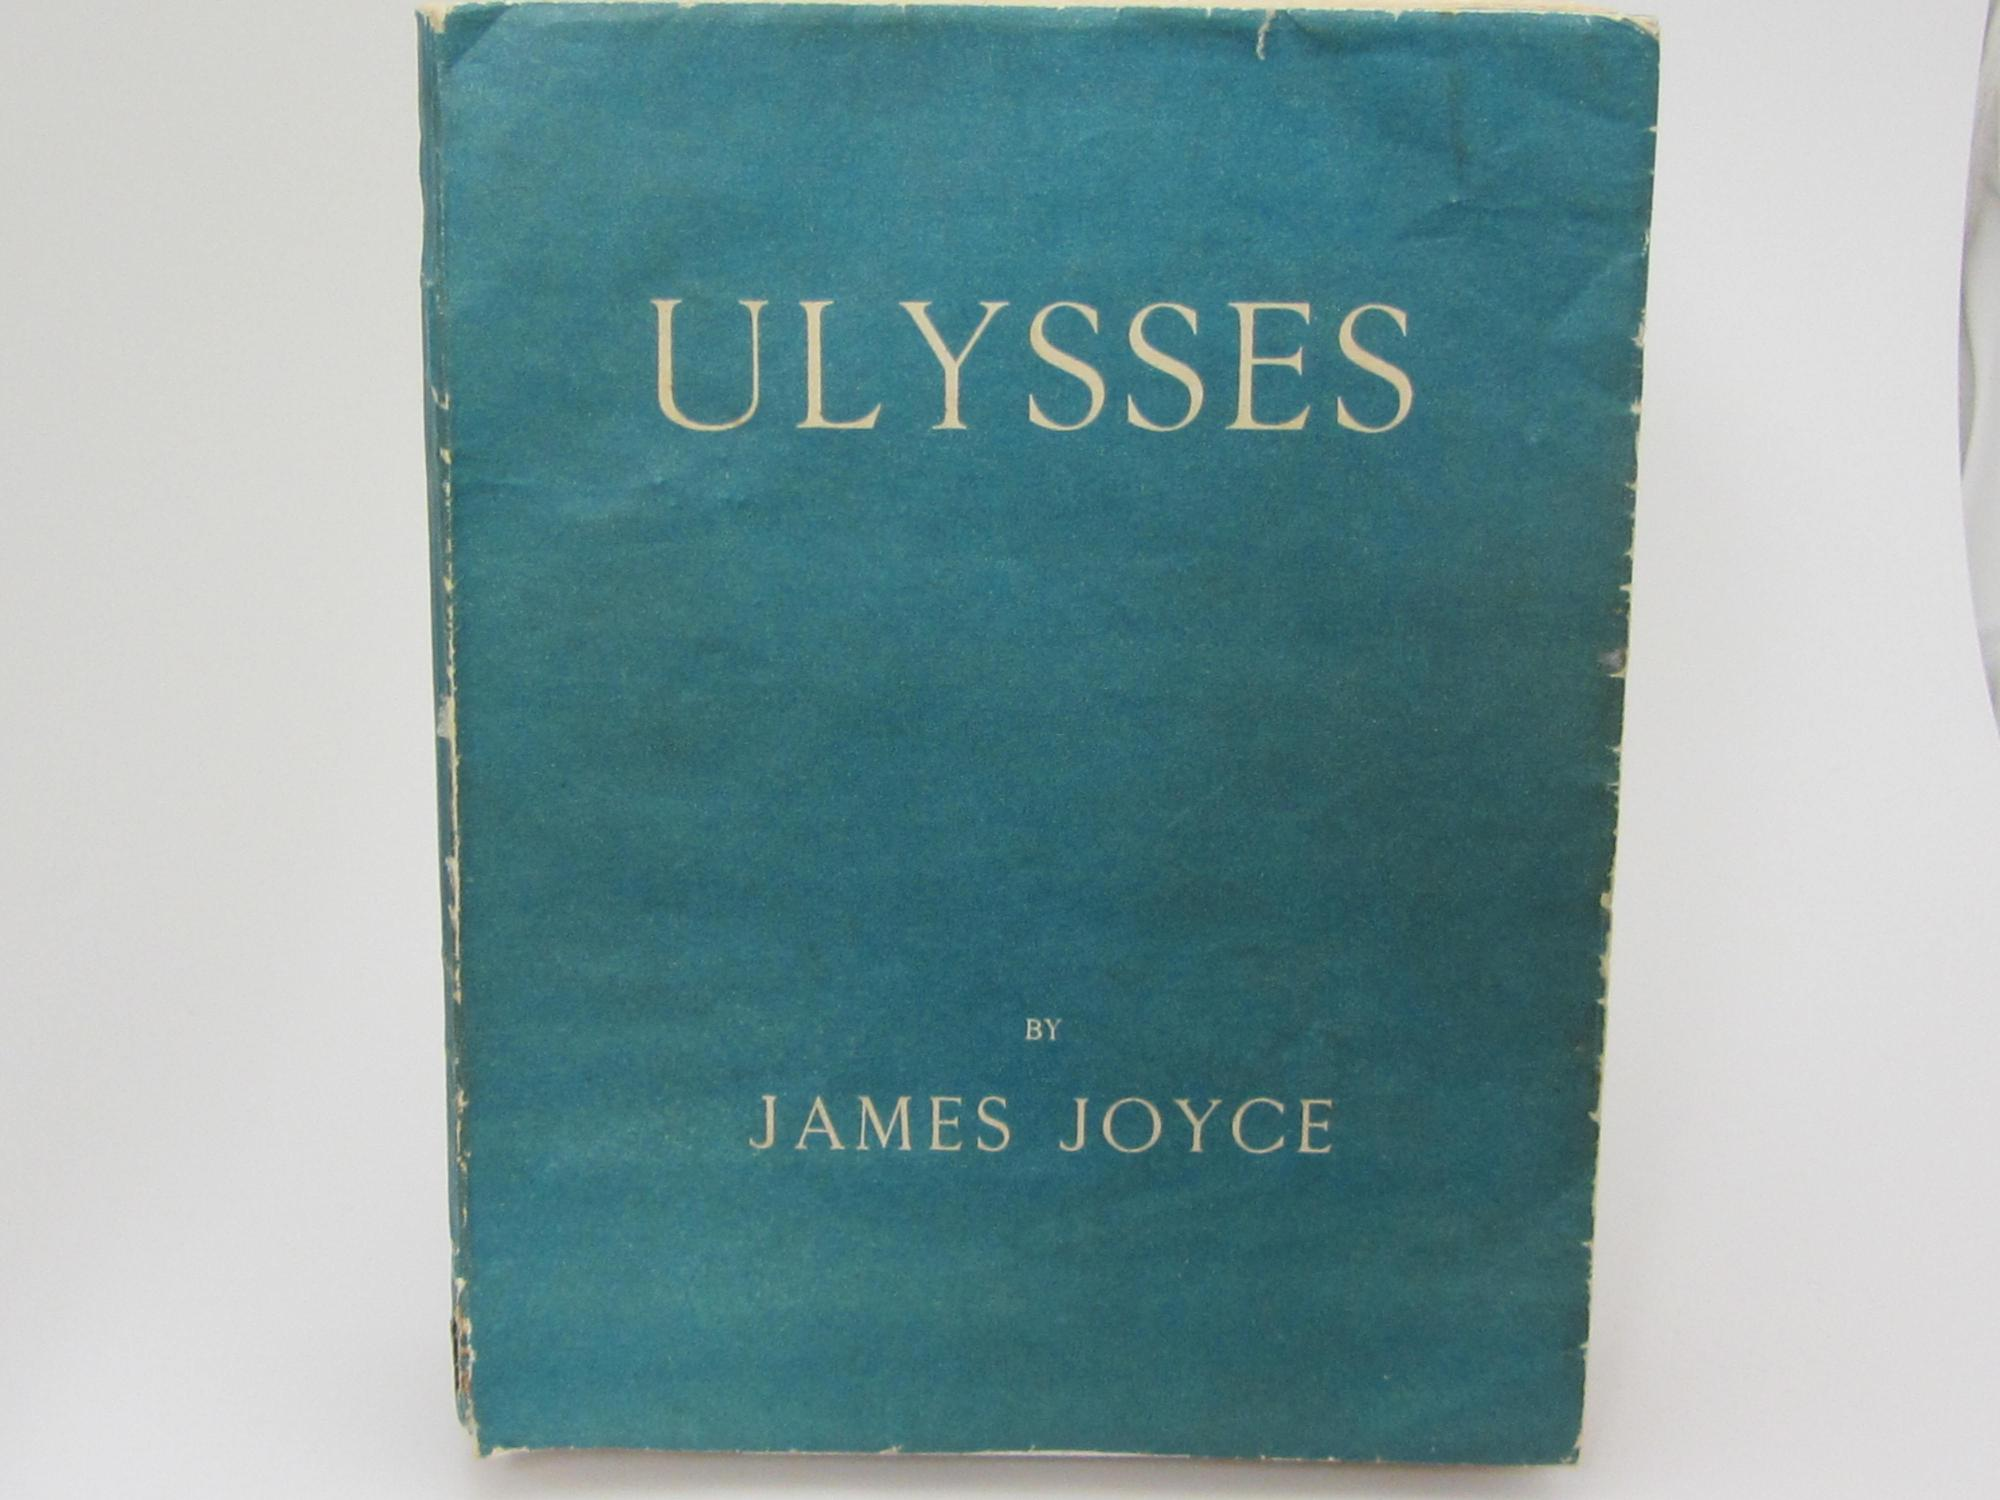 Ulysses Paris Shakespeare Co 1922